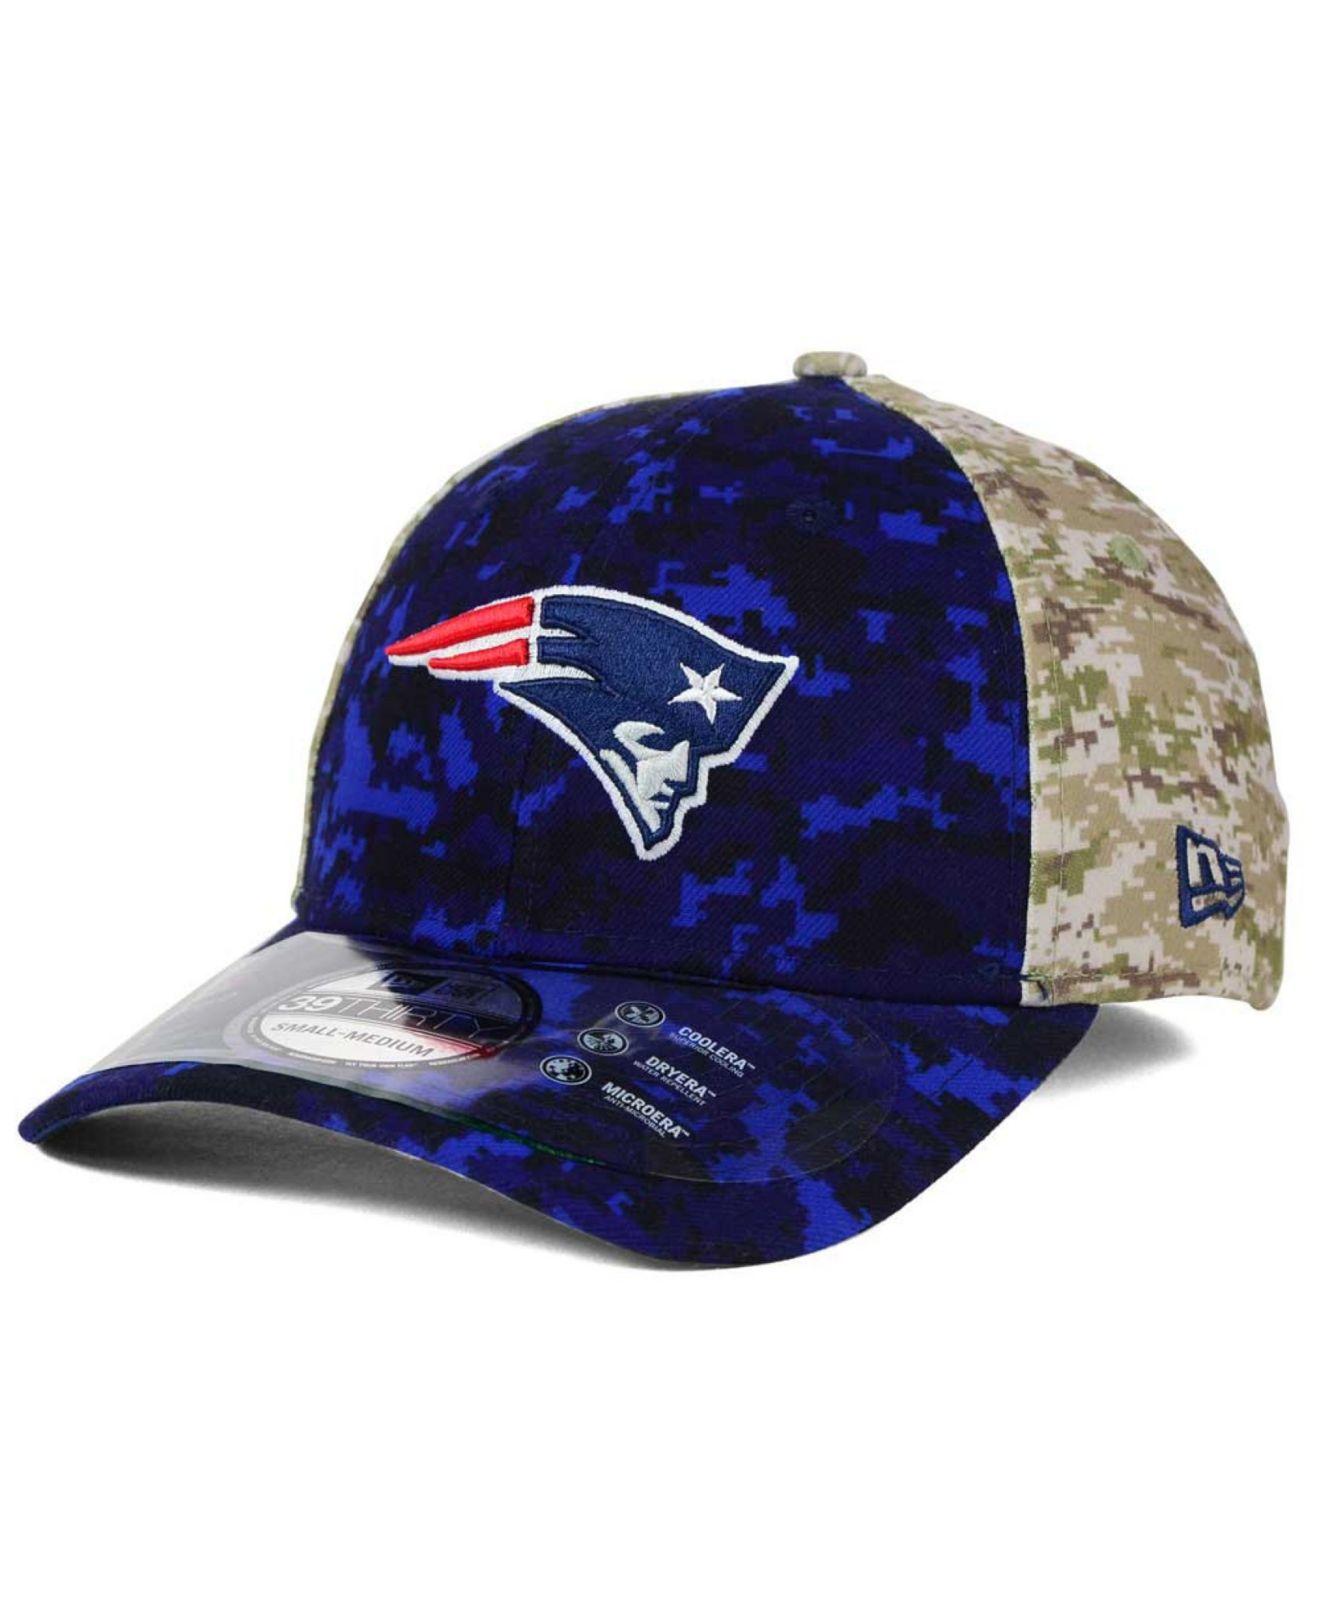 e9de7d24b6faf8 KTZ New England Patriots Salute To Service 39thirty Cap - Lyst